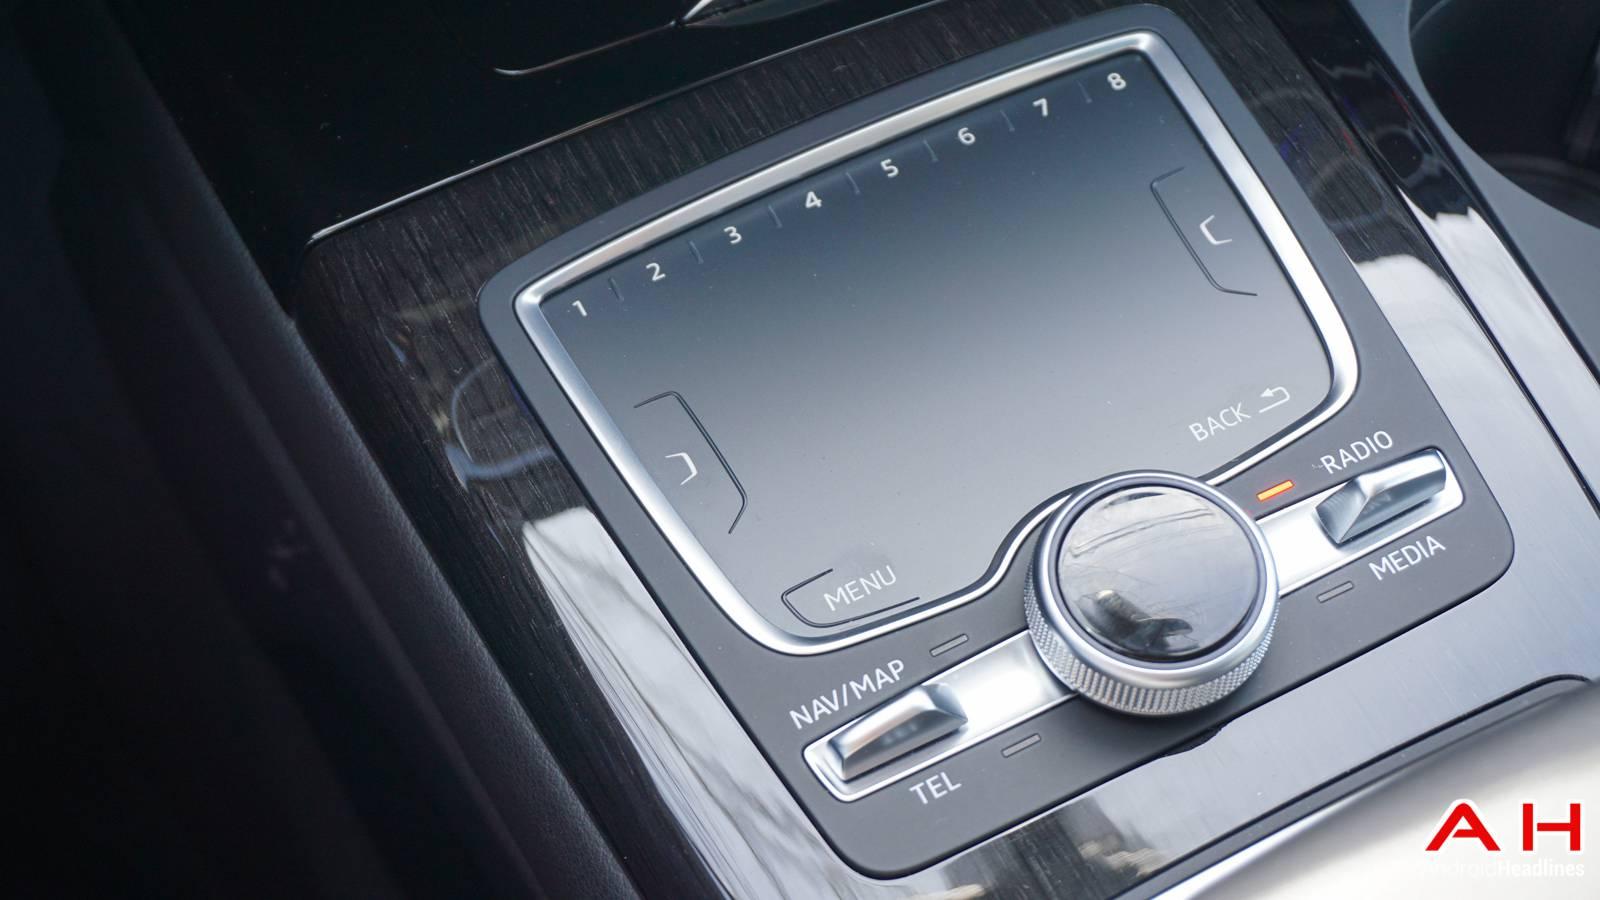 2017-Audi-Q7-Hands-On-AH-00002